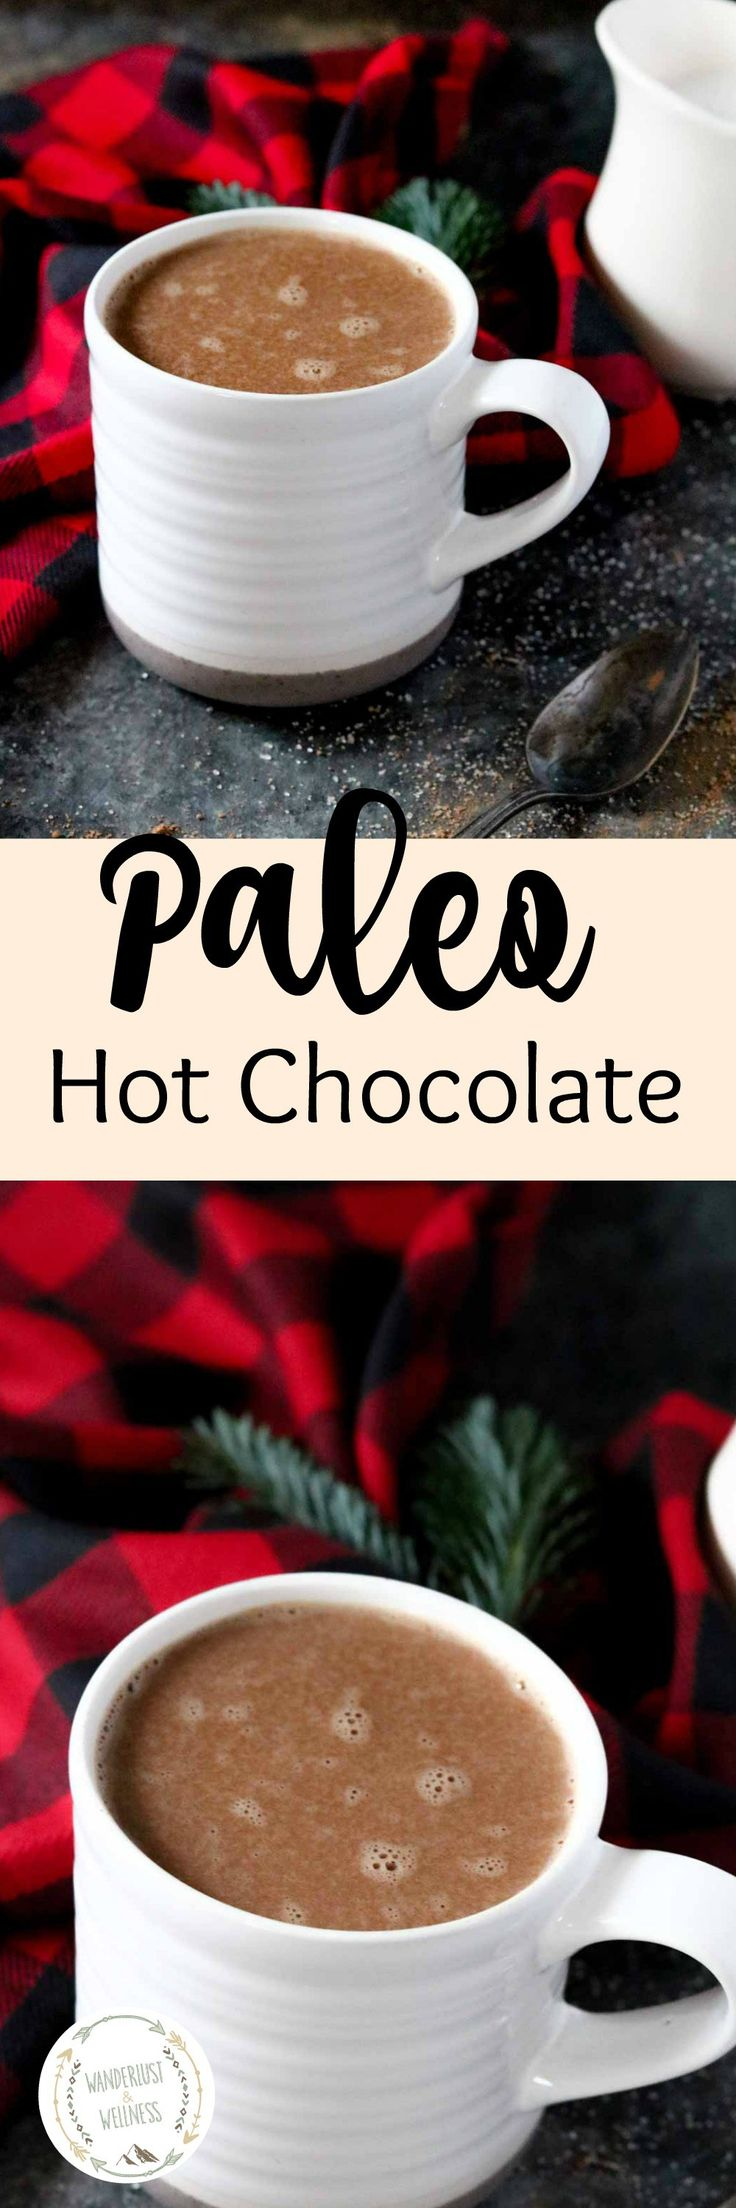 Best 25+ Paleo hot chocolate ideas on Pinterest | Healthy hot ...